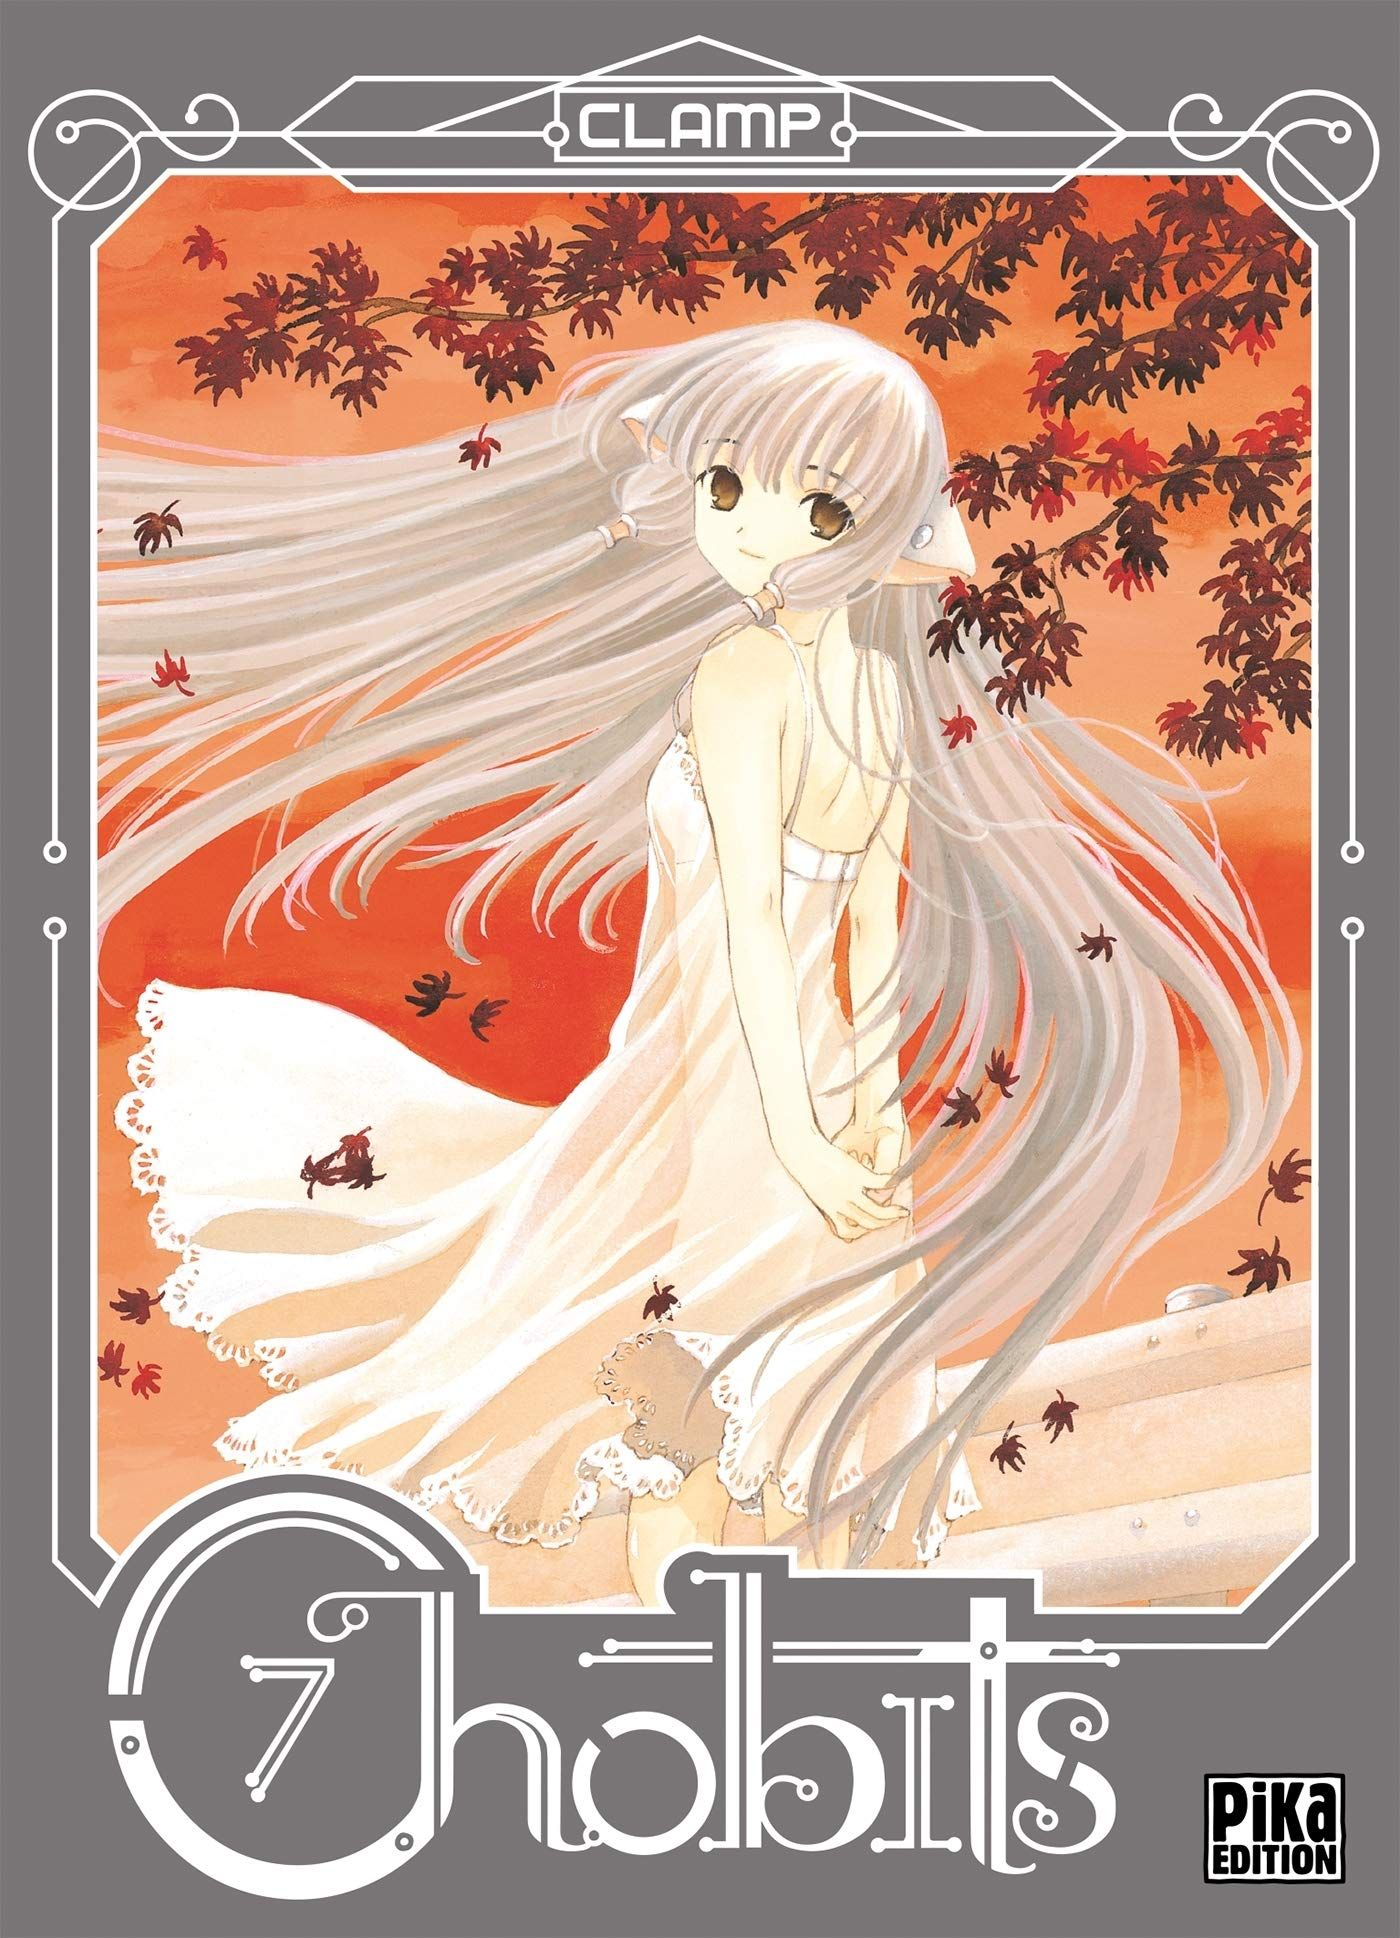 Sortie Manga au Québec JUIN 2021 Chobits-20-ans-7-pika